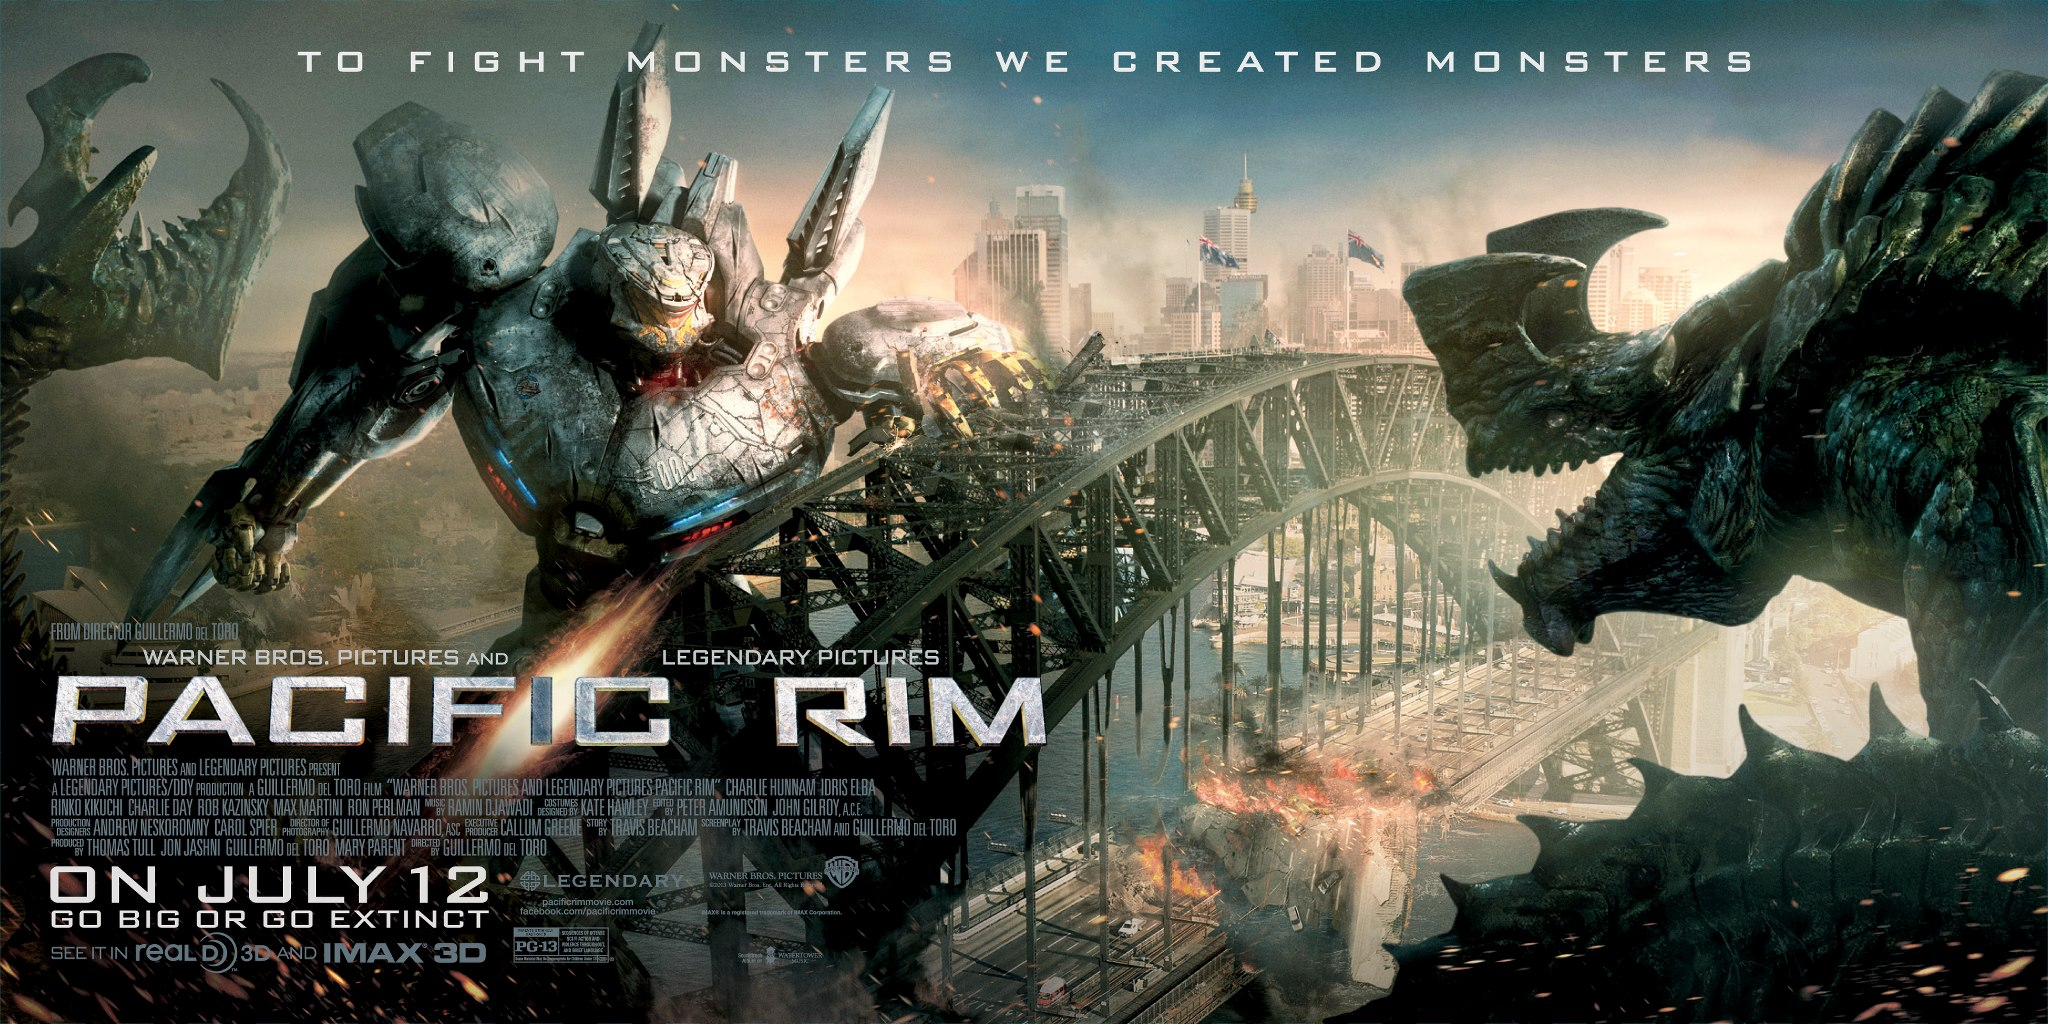 pacific-rim-movie-banner-striker-eureka-jaeger-vs-kaiju ... Pacific Rim Cast